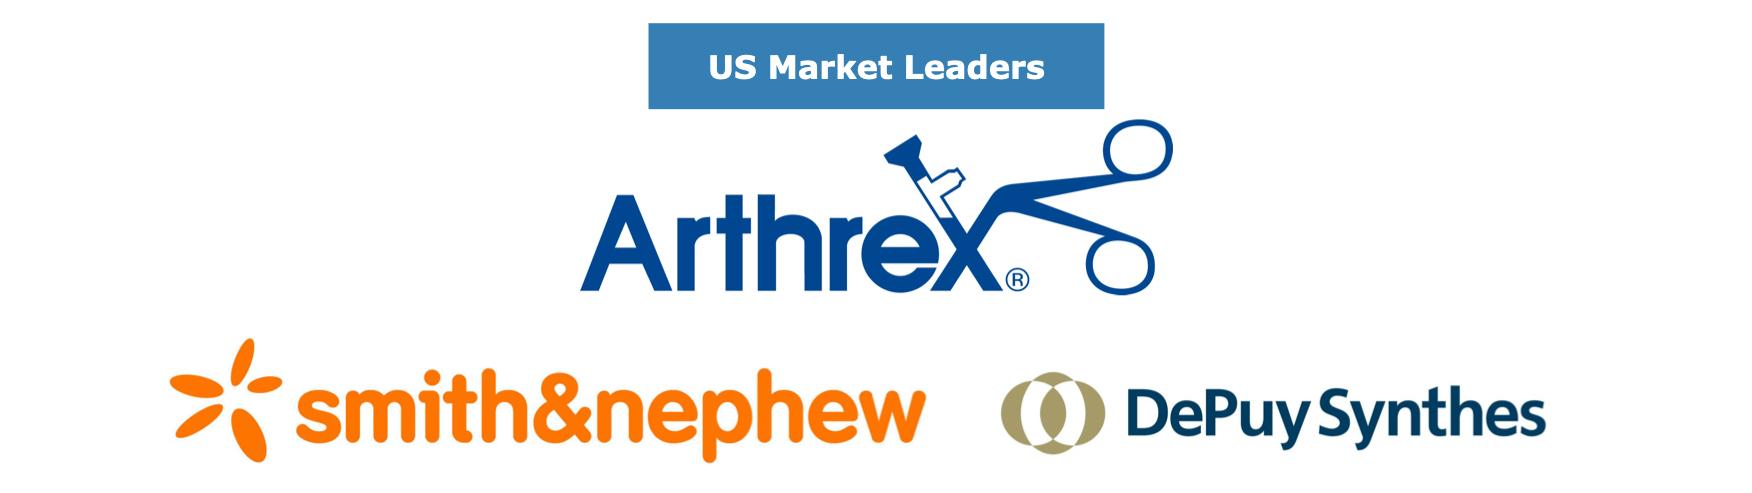 US Orthopedic Soft Tissue Repair Market Leaders